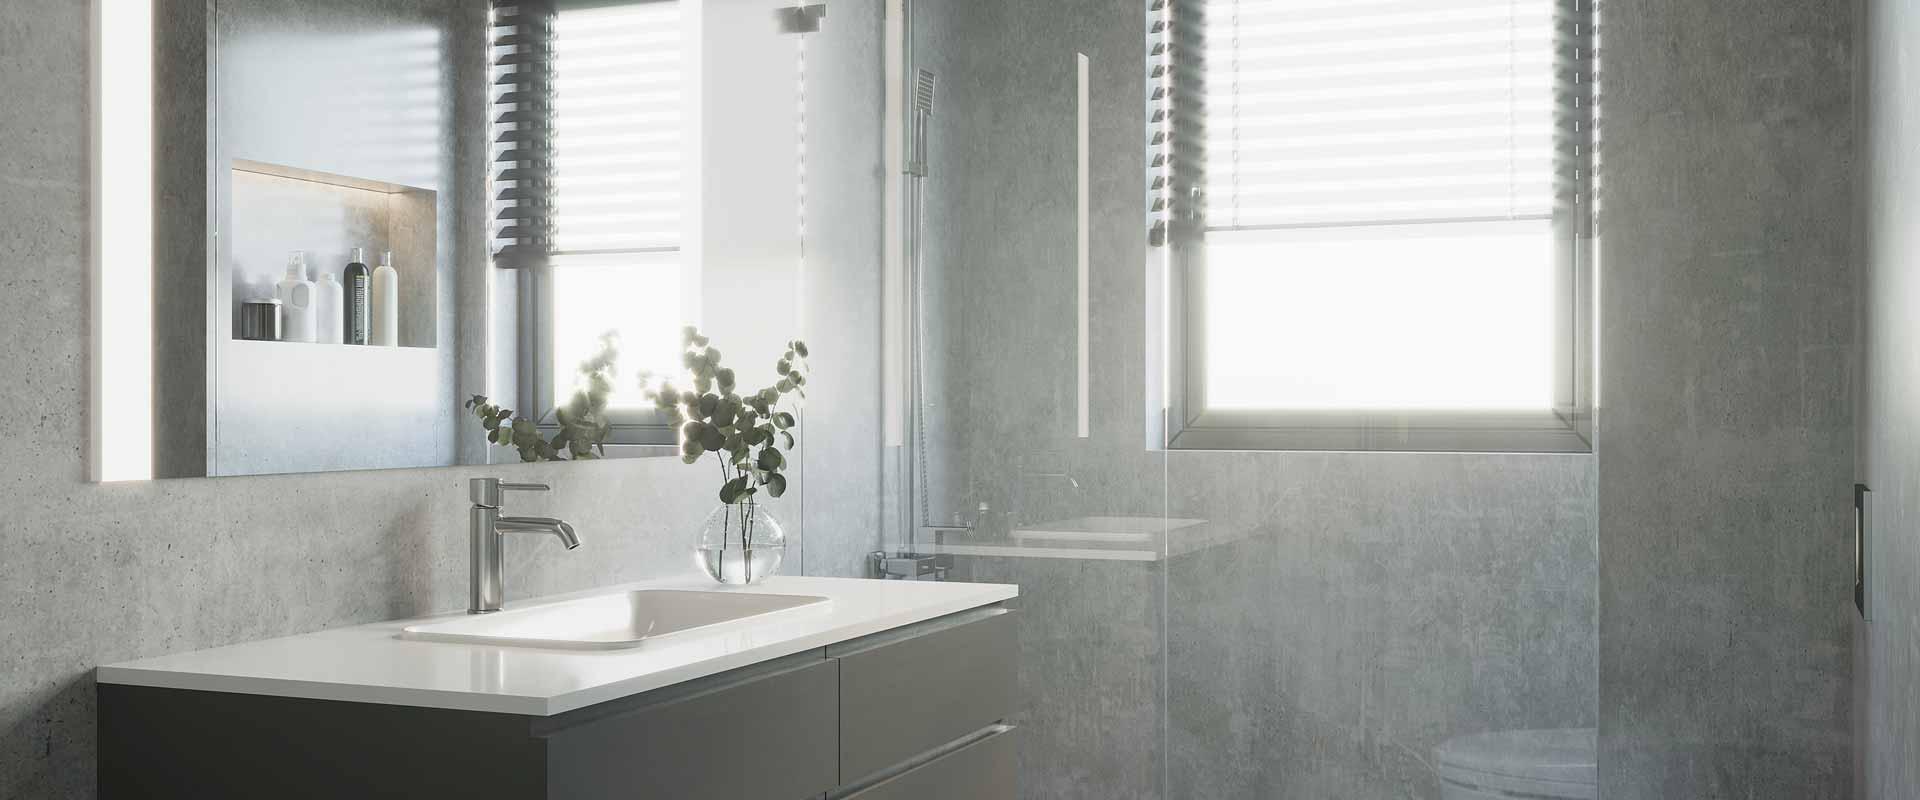 Elkington Bathrooms Hall Green